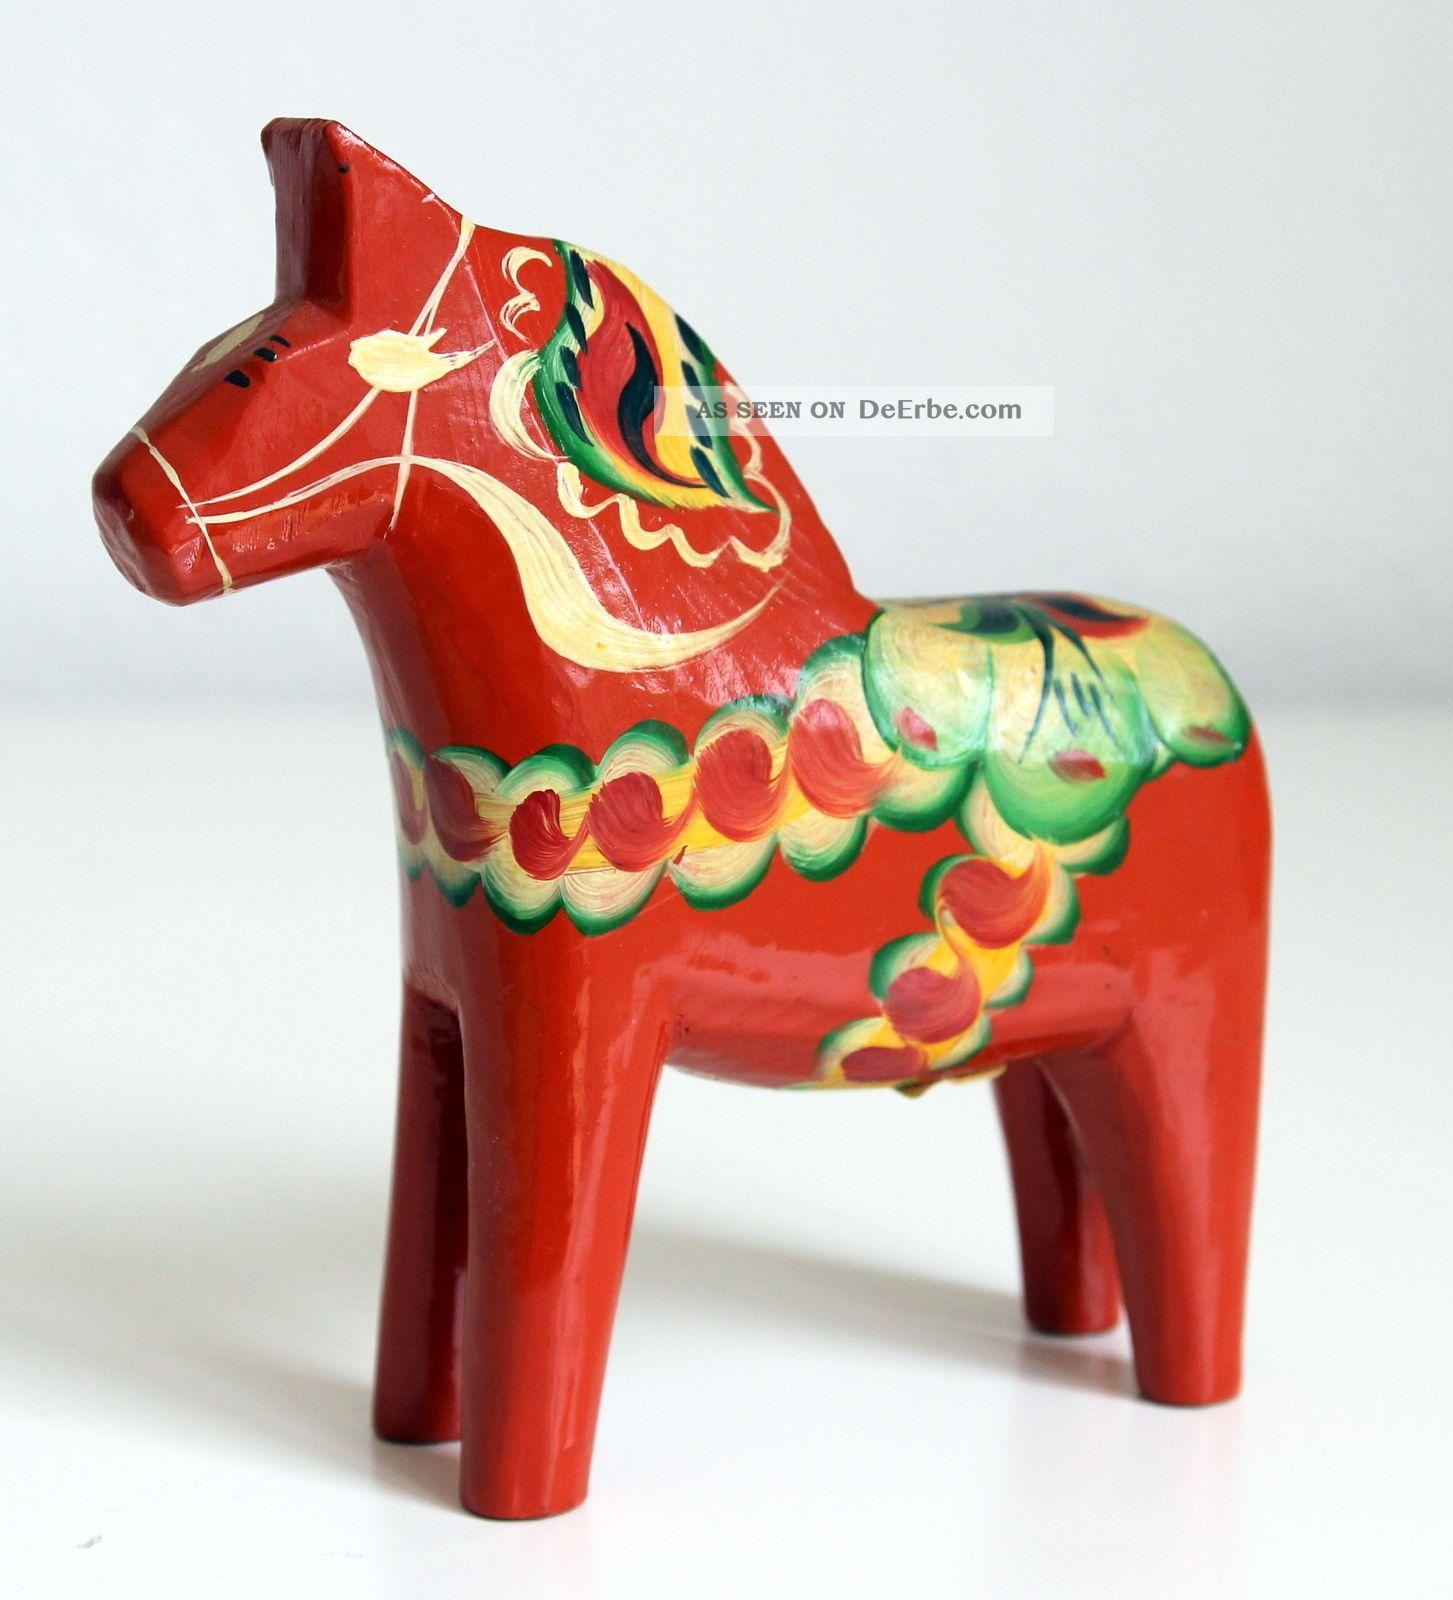 Dalarna Pferd dalapferd dalarnapferd äkta sweden olsson 13 cm vintage mit